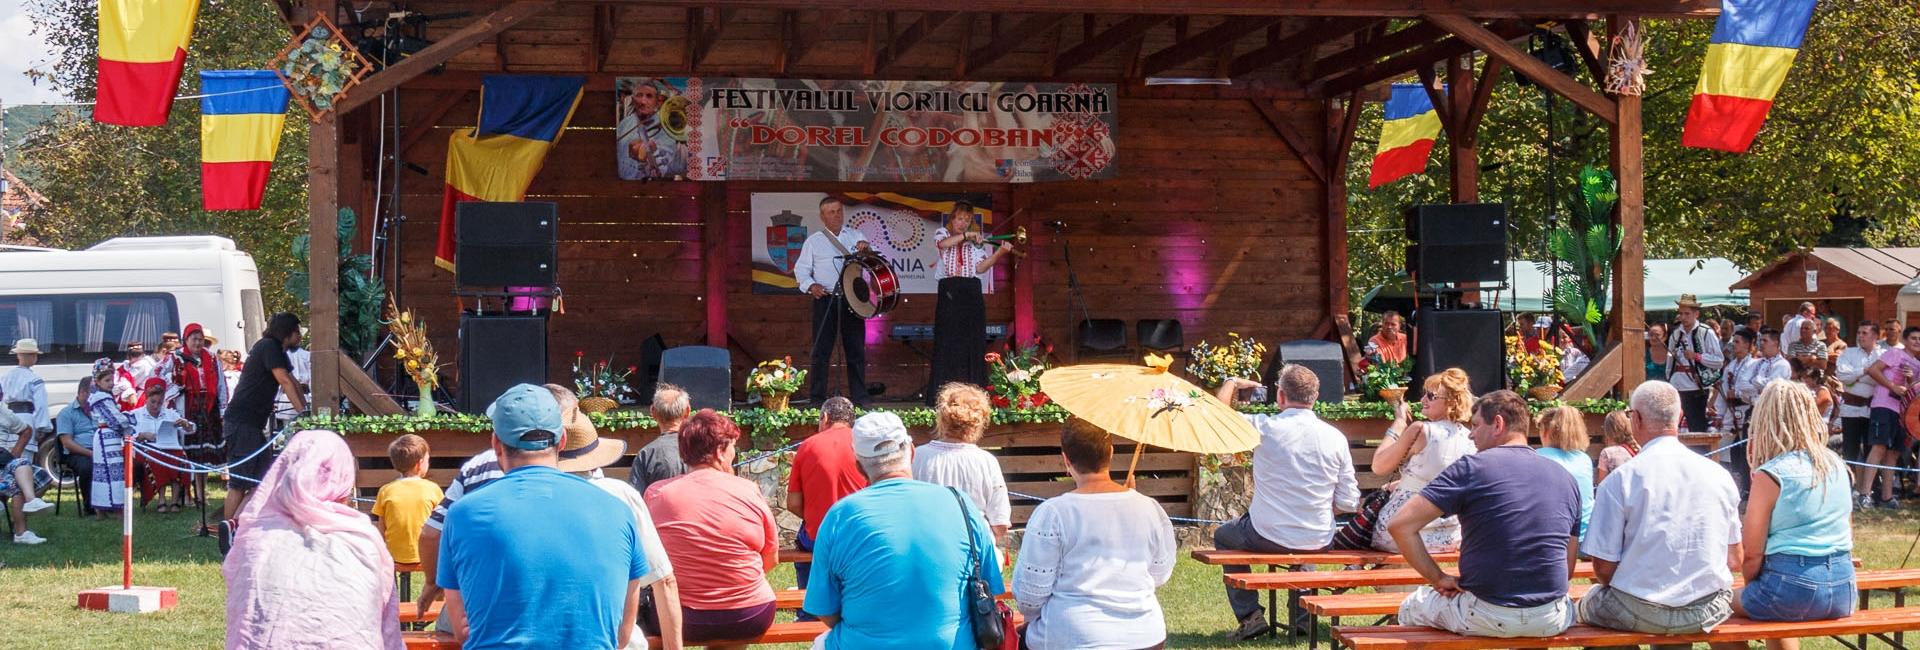 Festivalul viorii cu goarna Dorel Codoban